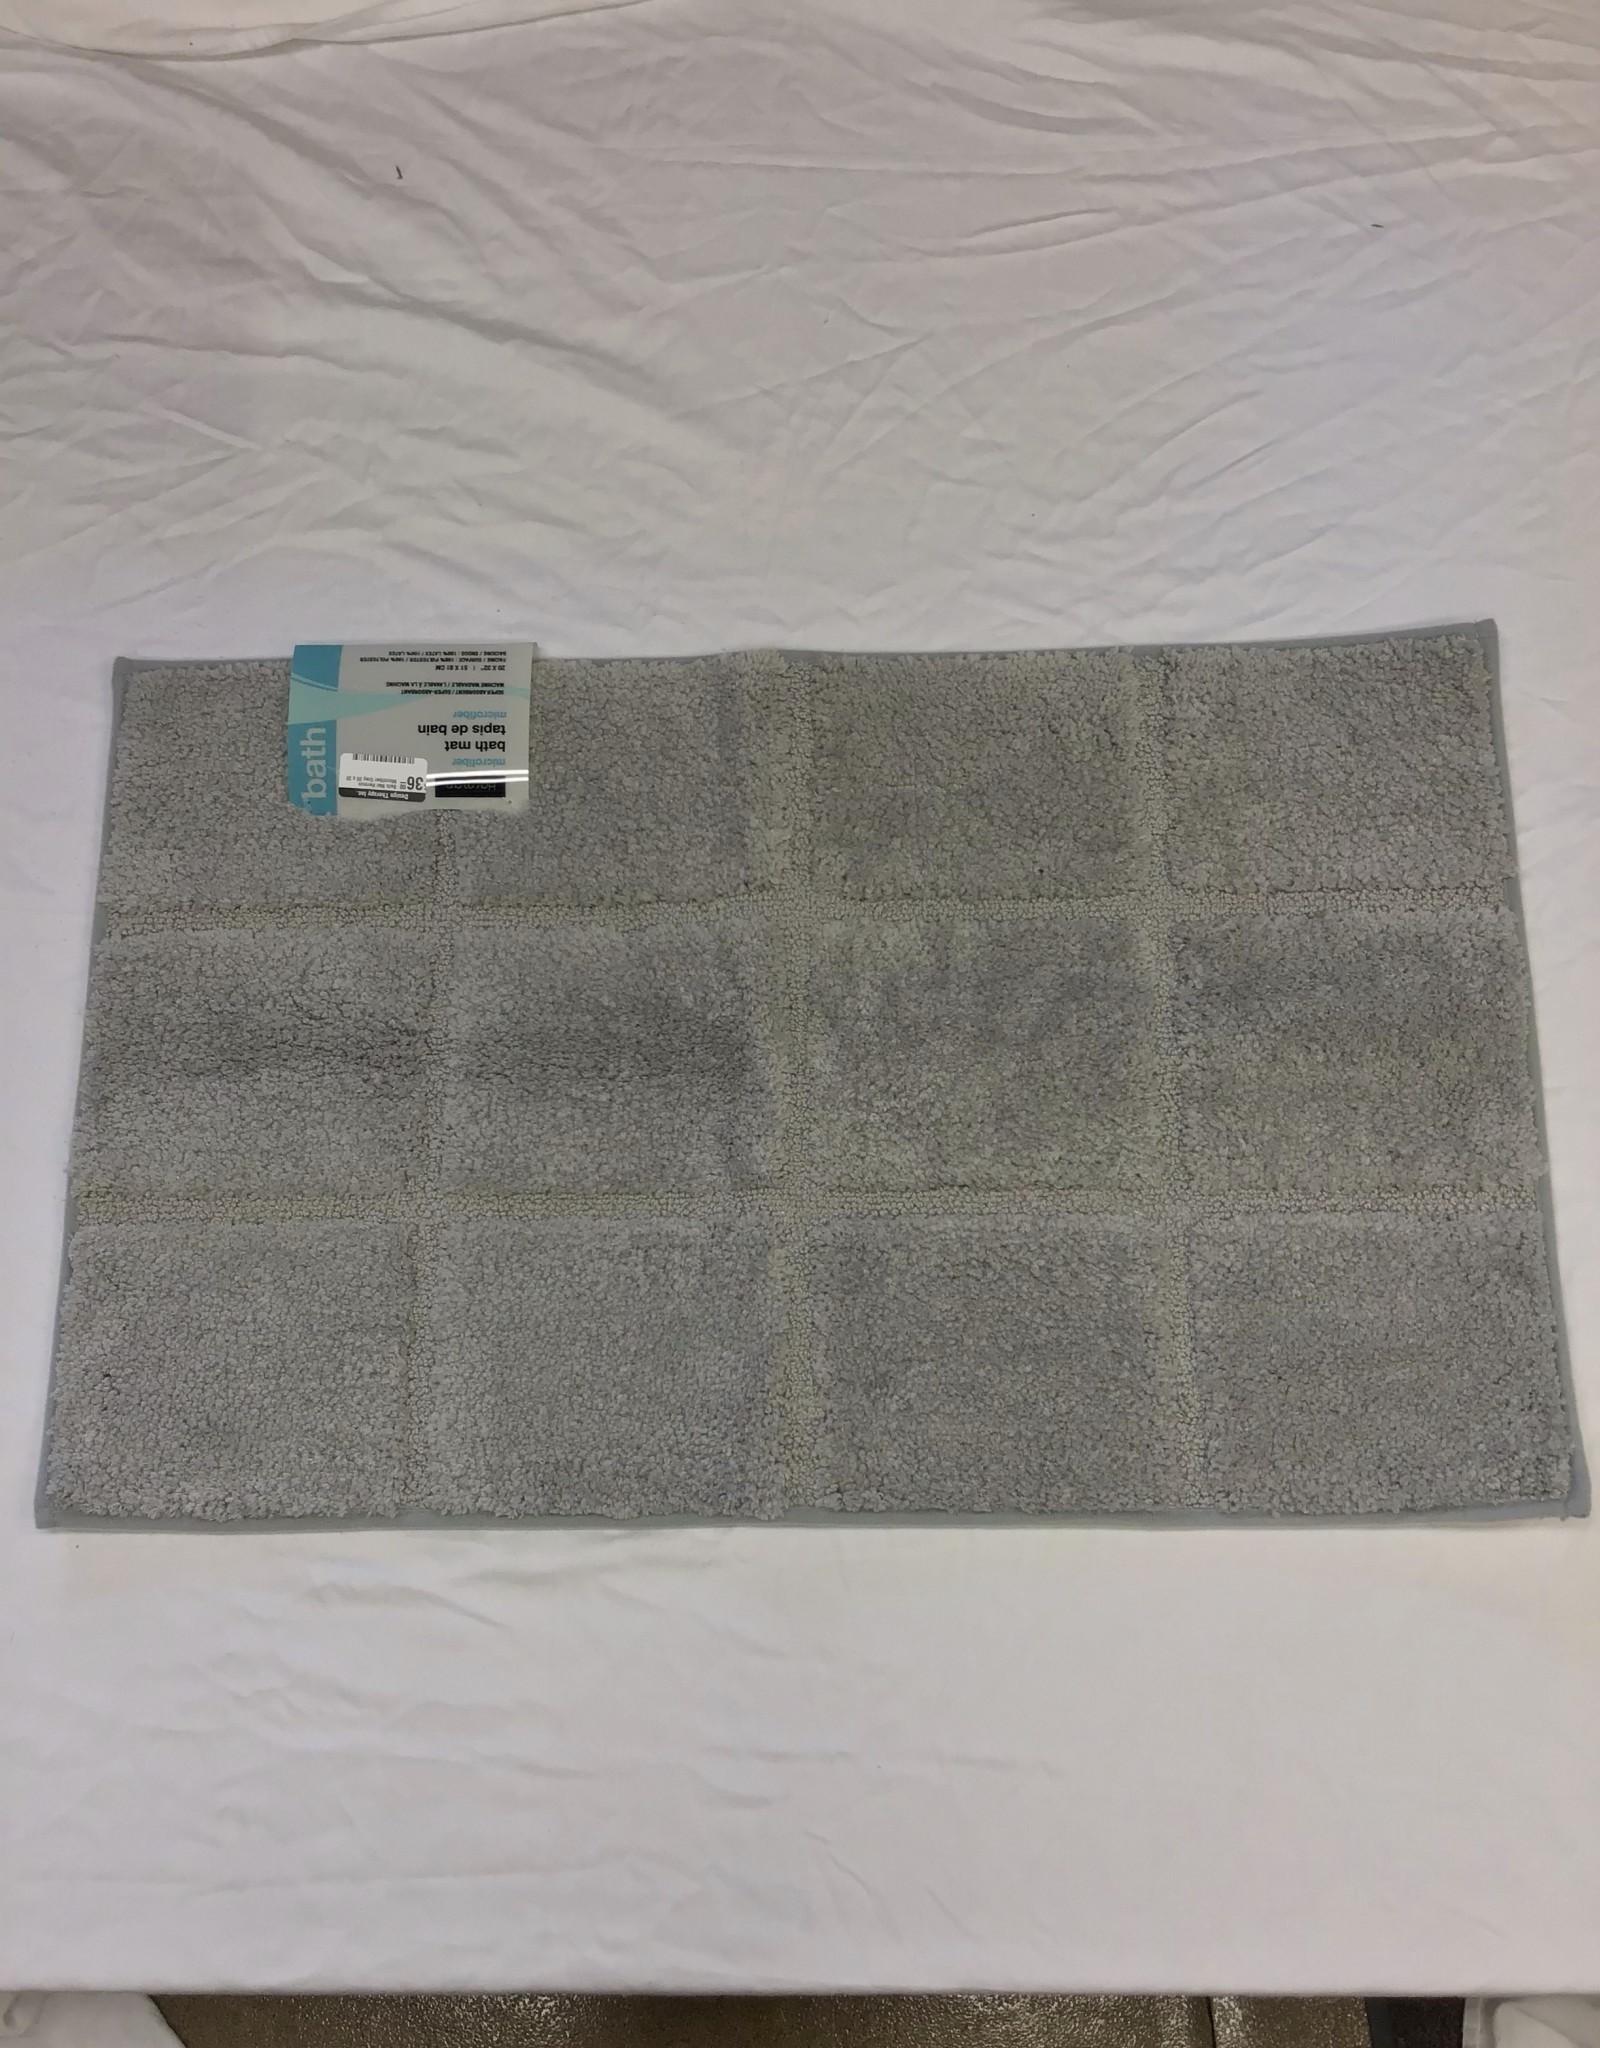 Bath Mat Harman Microfiber Grey 20 x 32